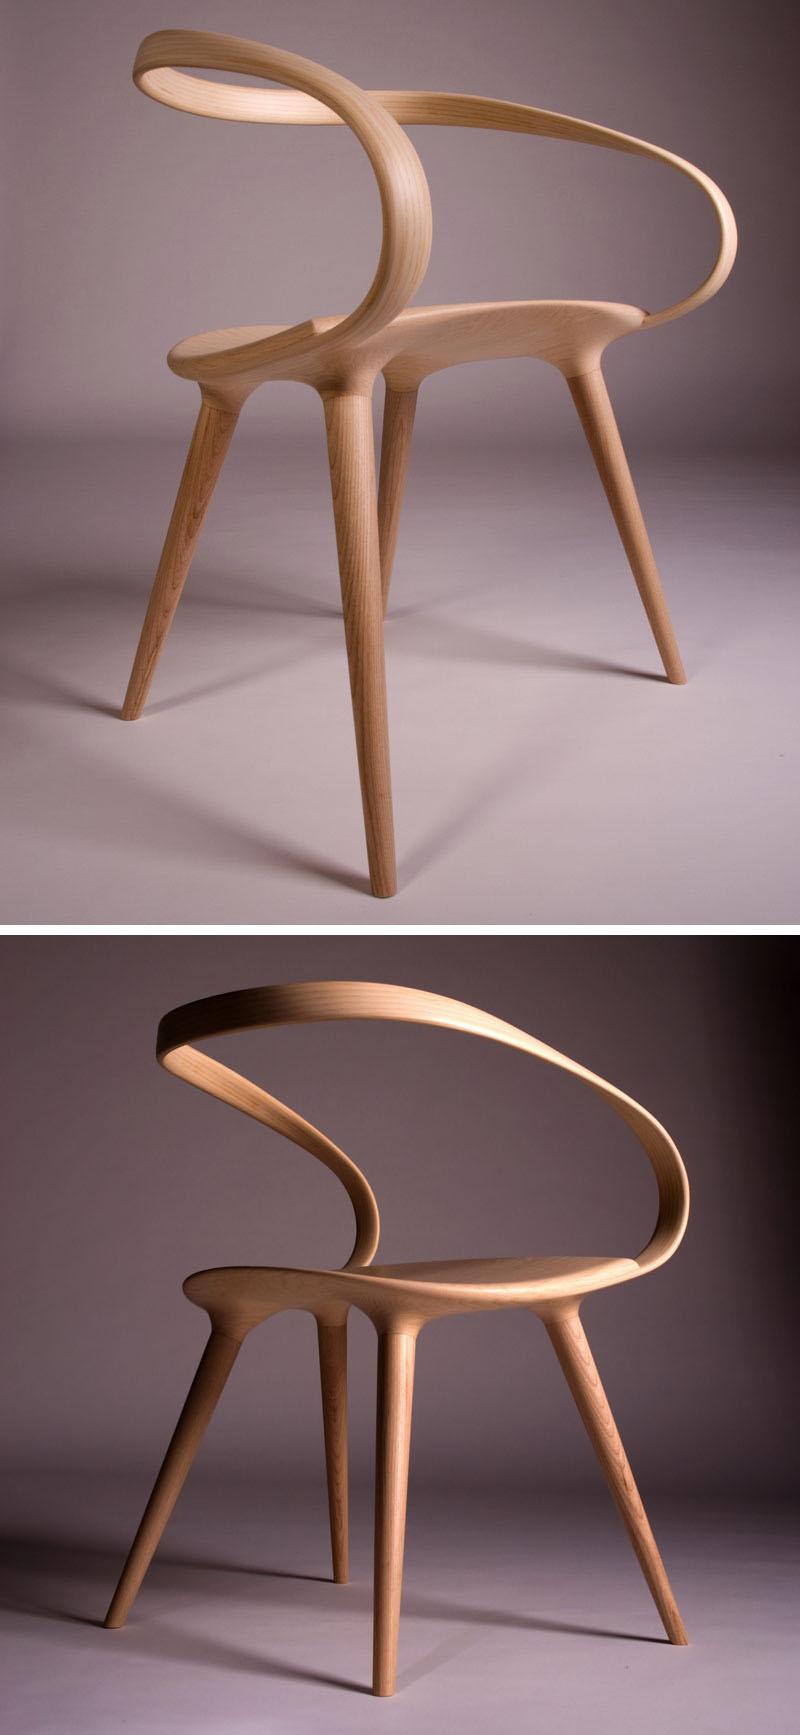 velo chair (3)